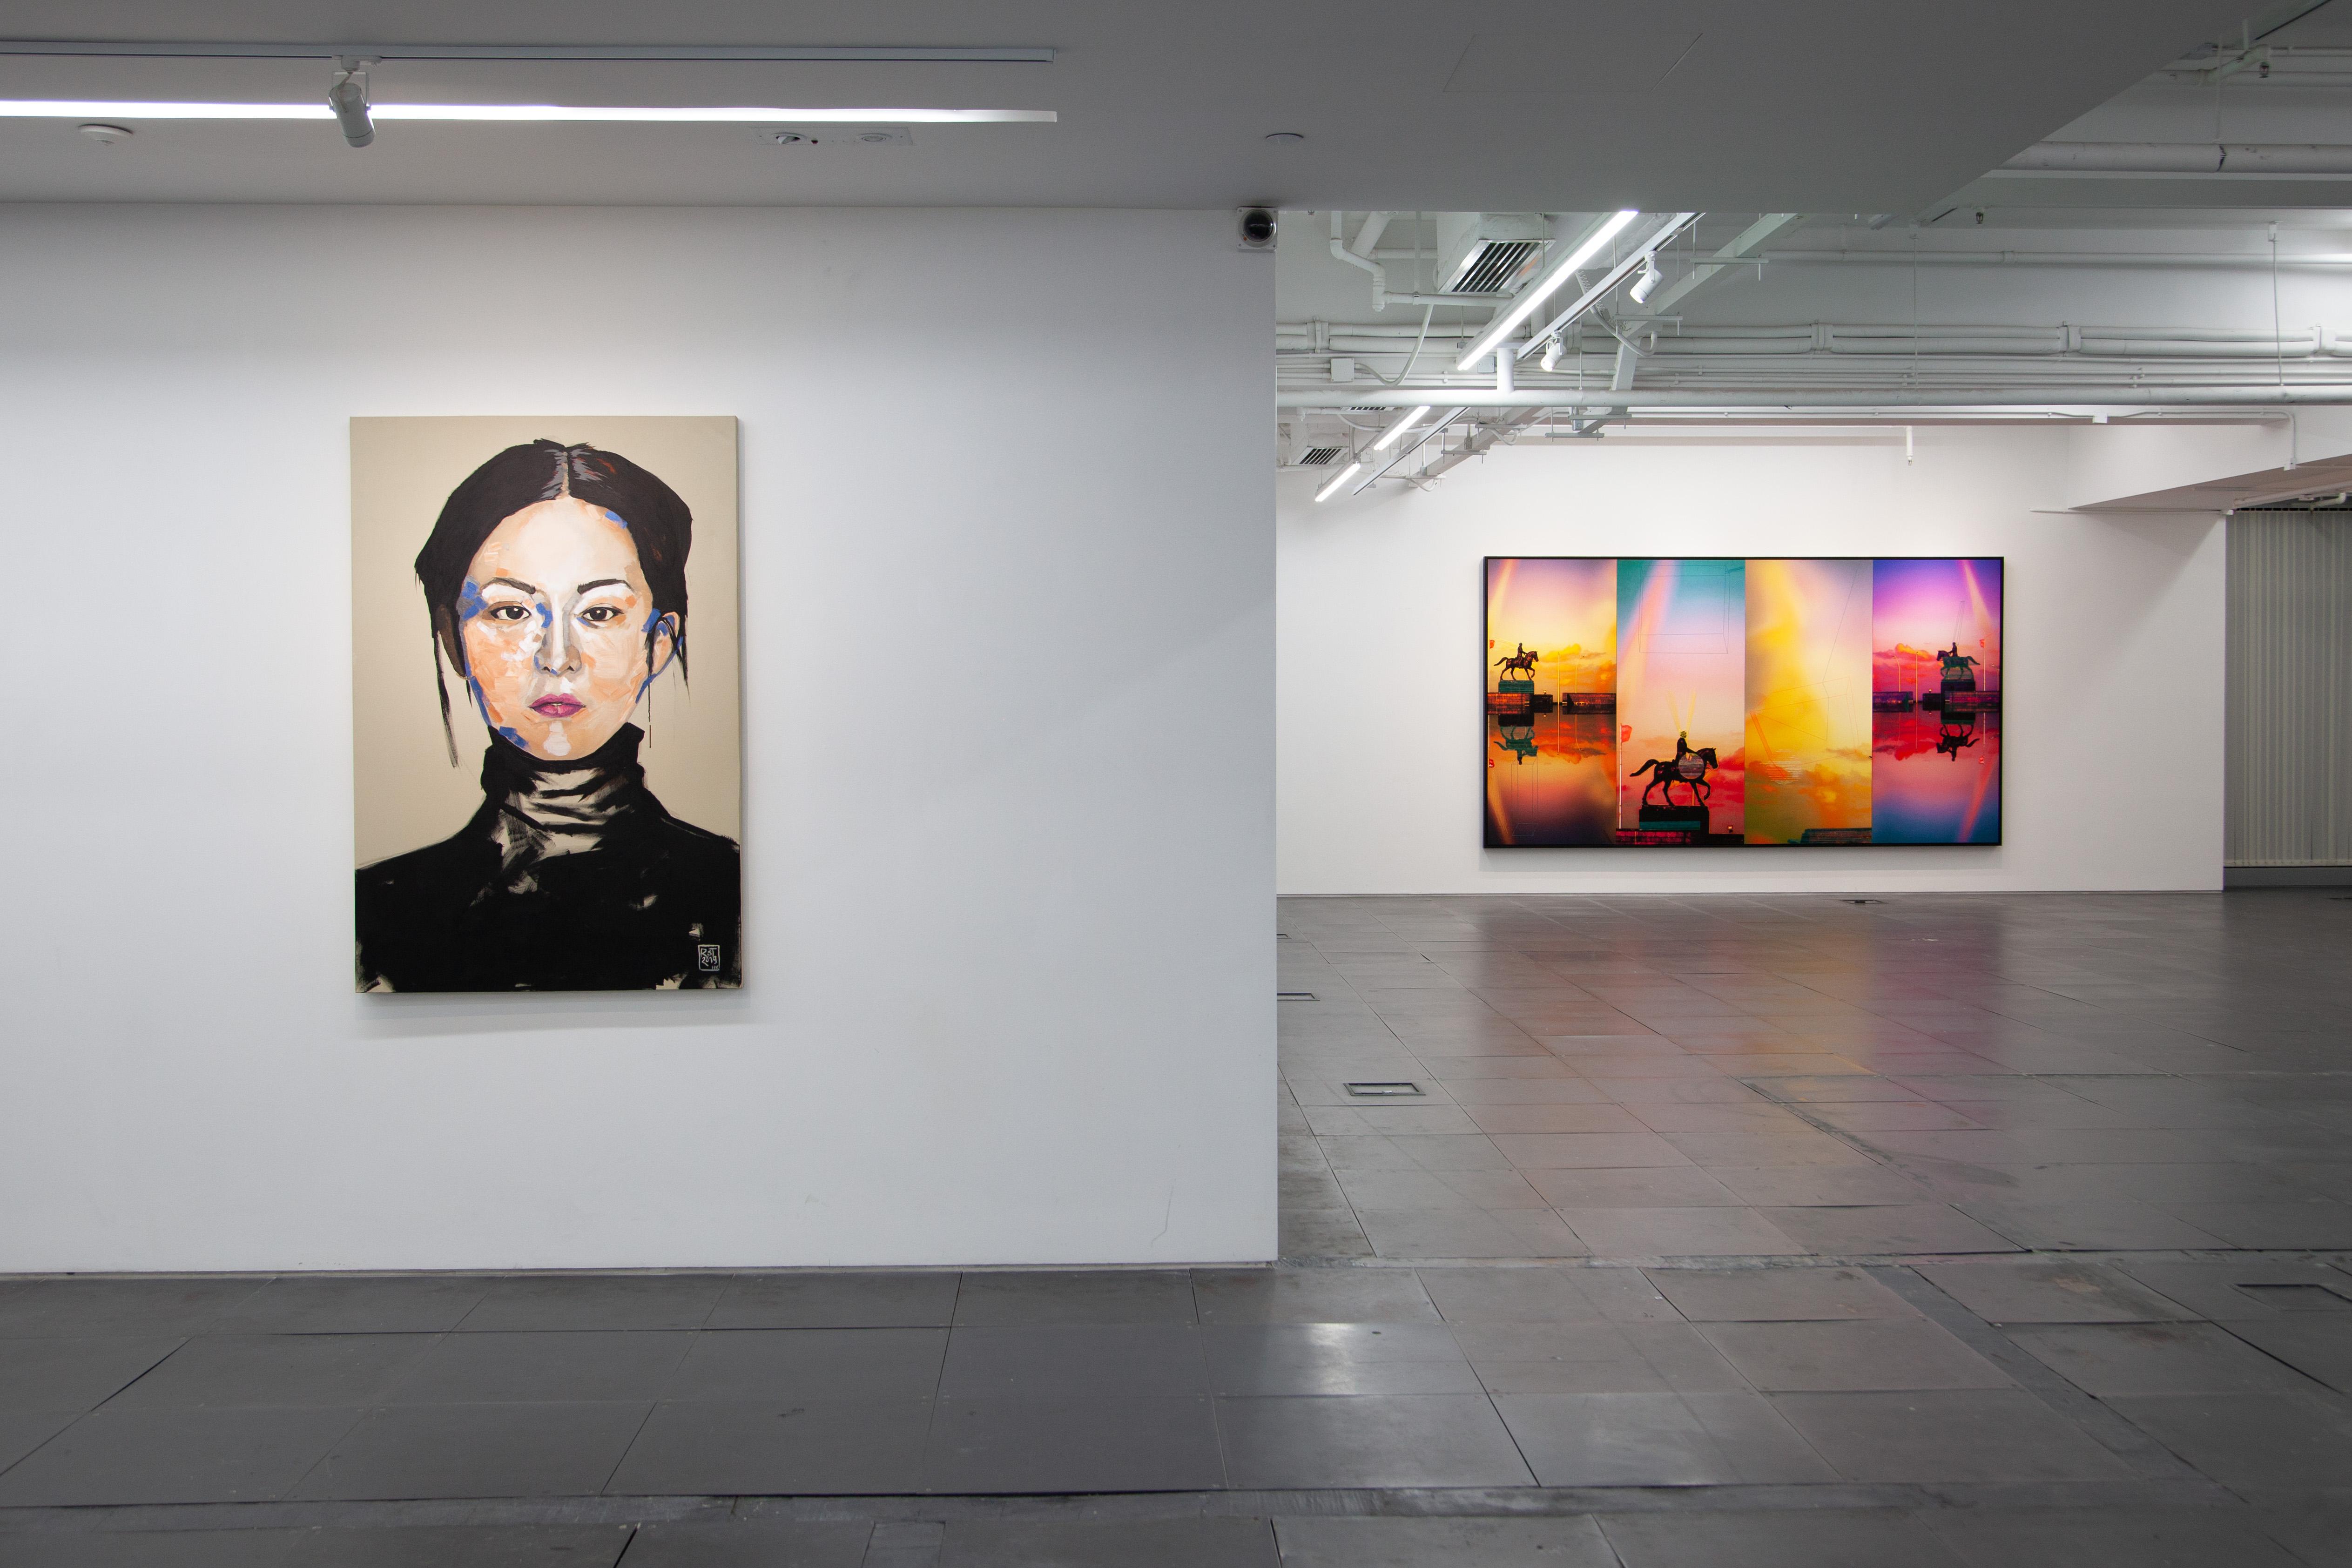 Pascal de Sarthe 於 《Artnet News》談論黃竹坑畫廊